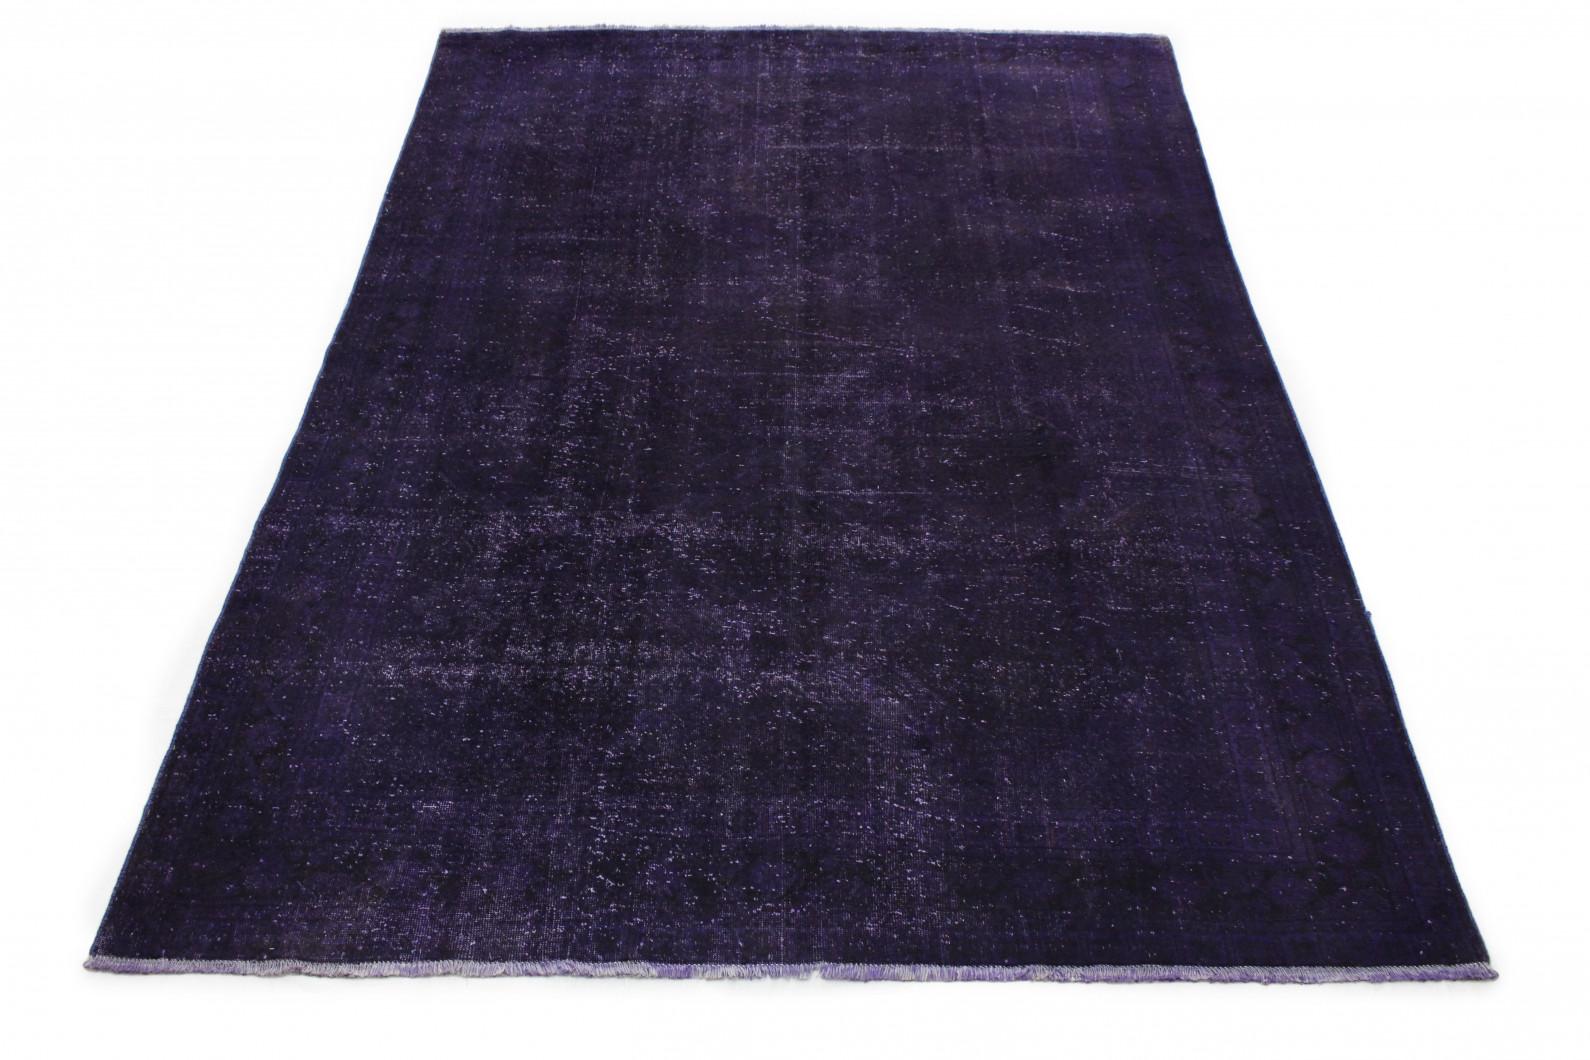 Vintage Teppich Lila in 320x210cm